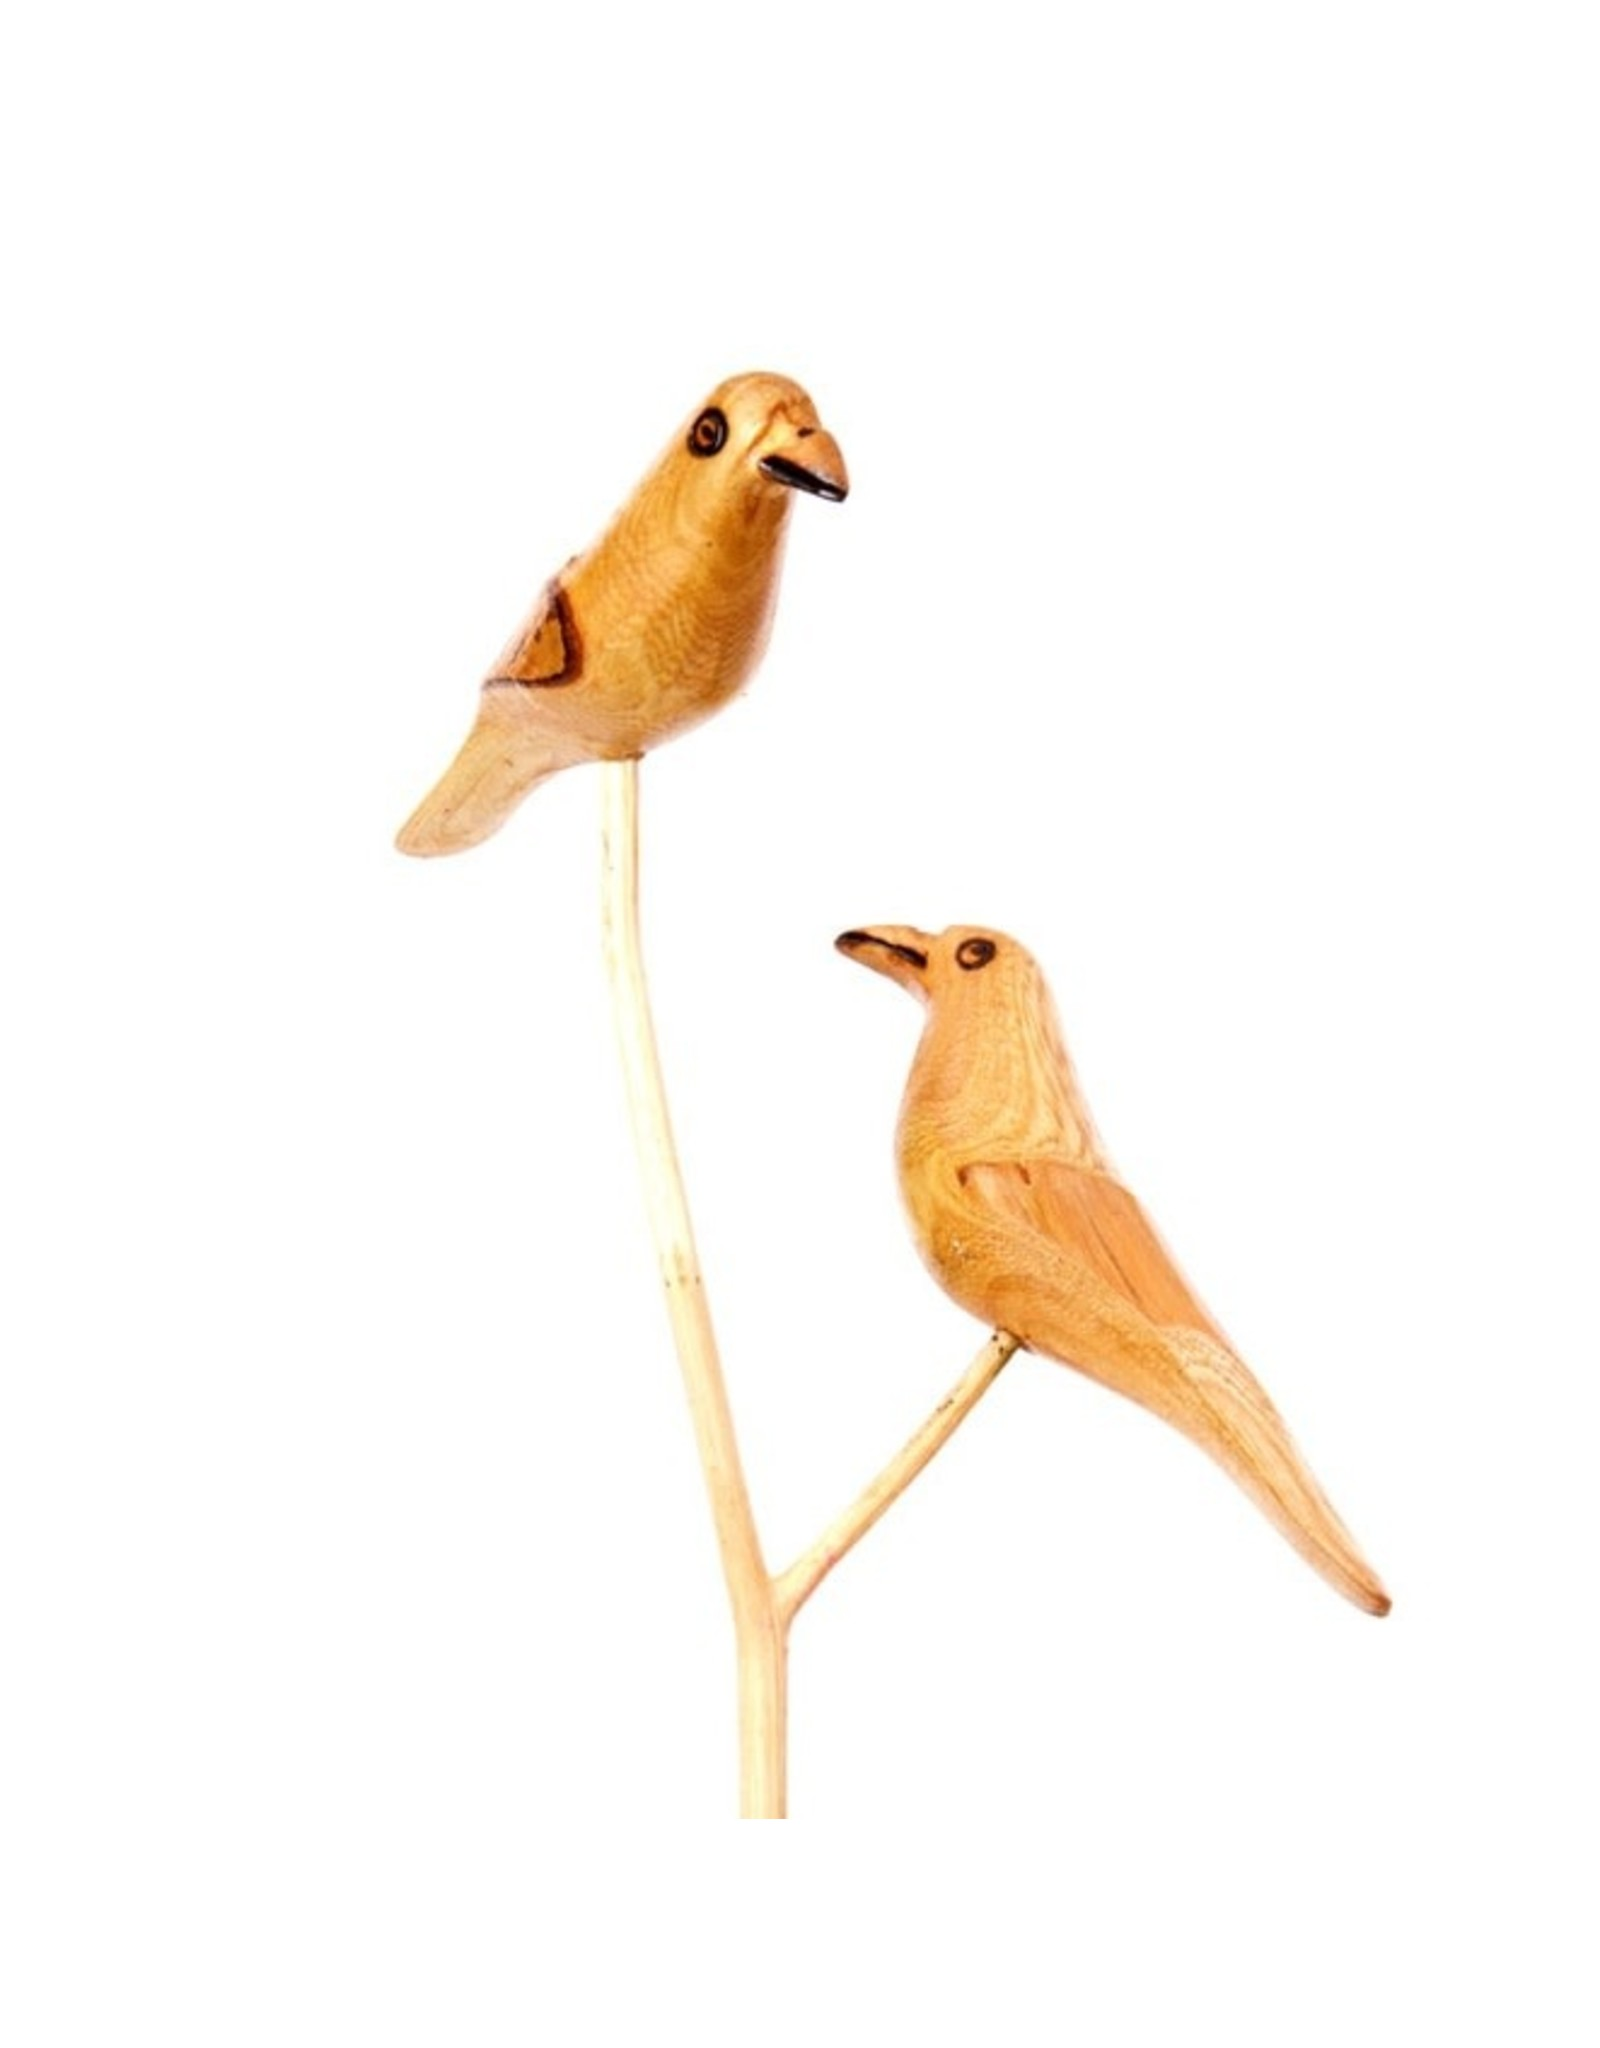 Swahili Wholesale Bird Duo Wooden Garden Stake, Kenya